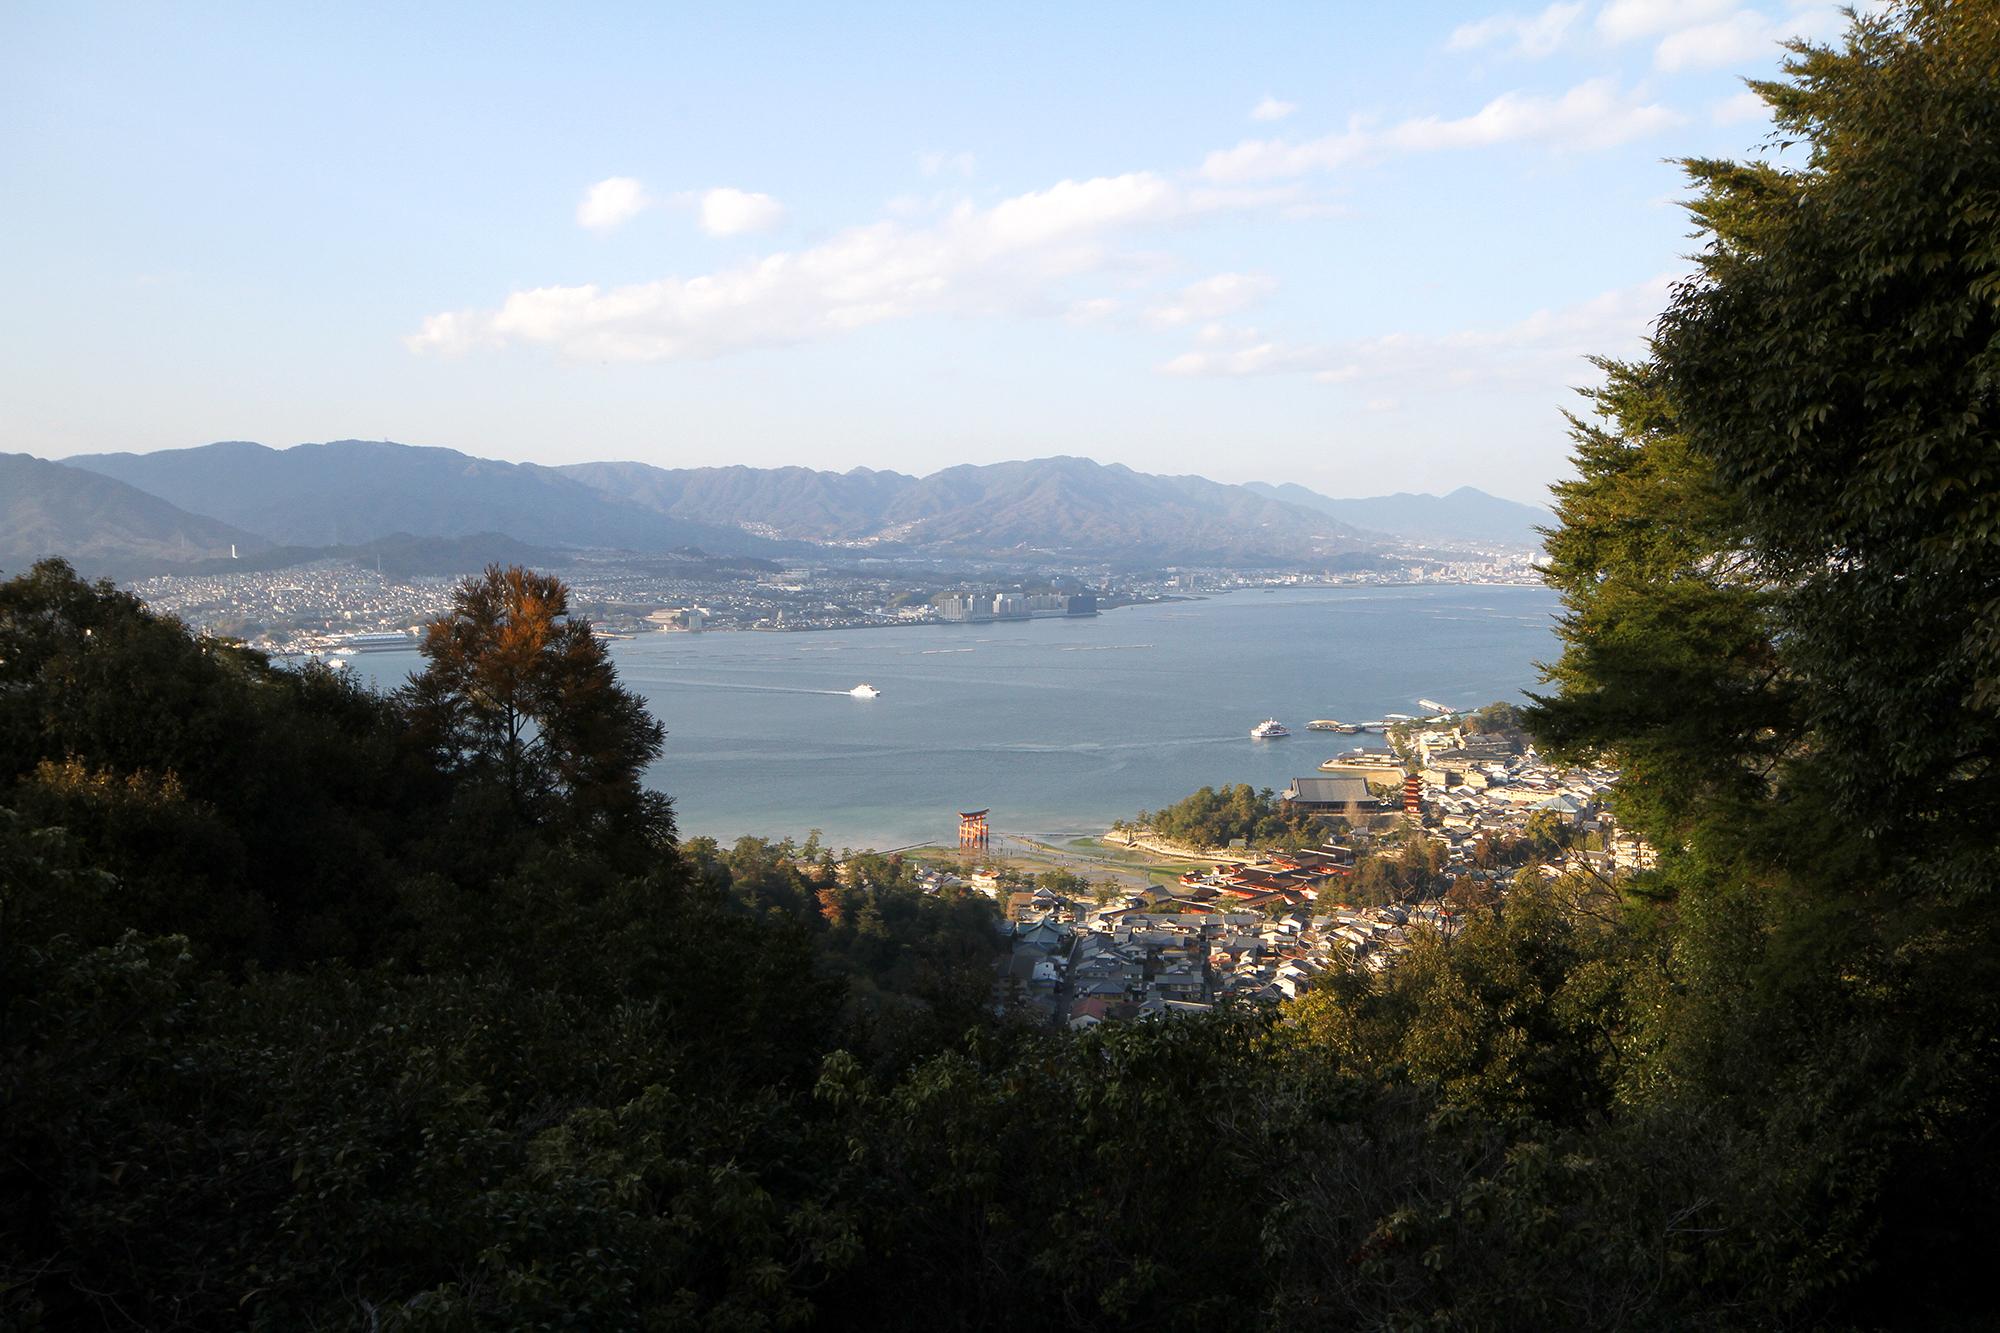 Winslow - Japan